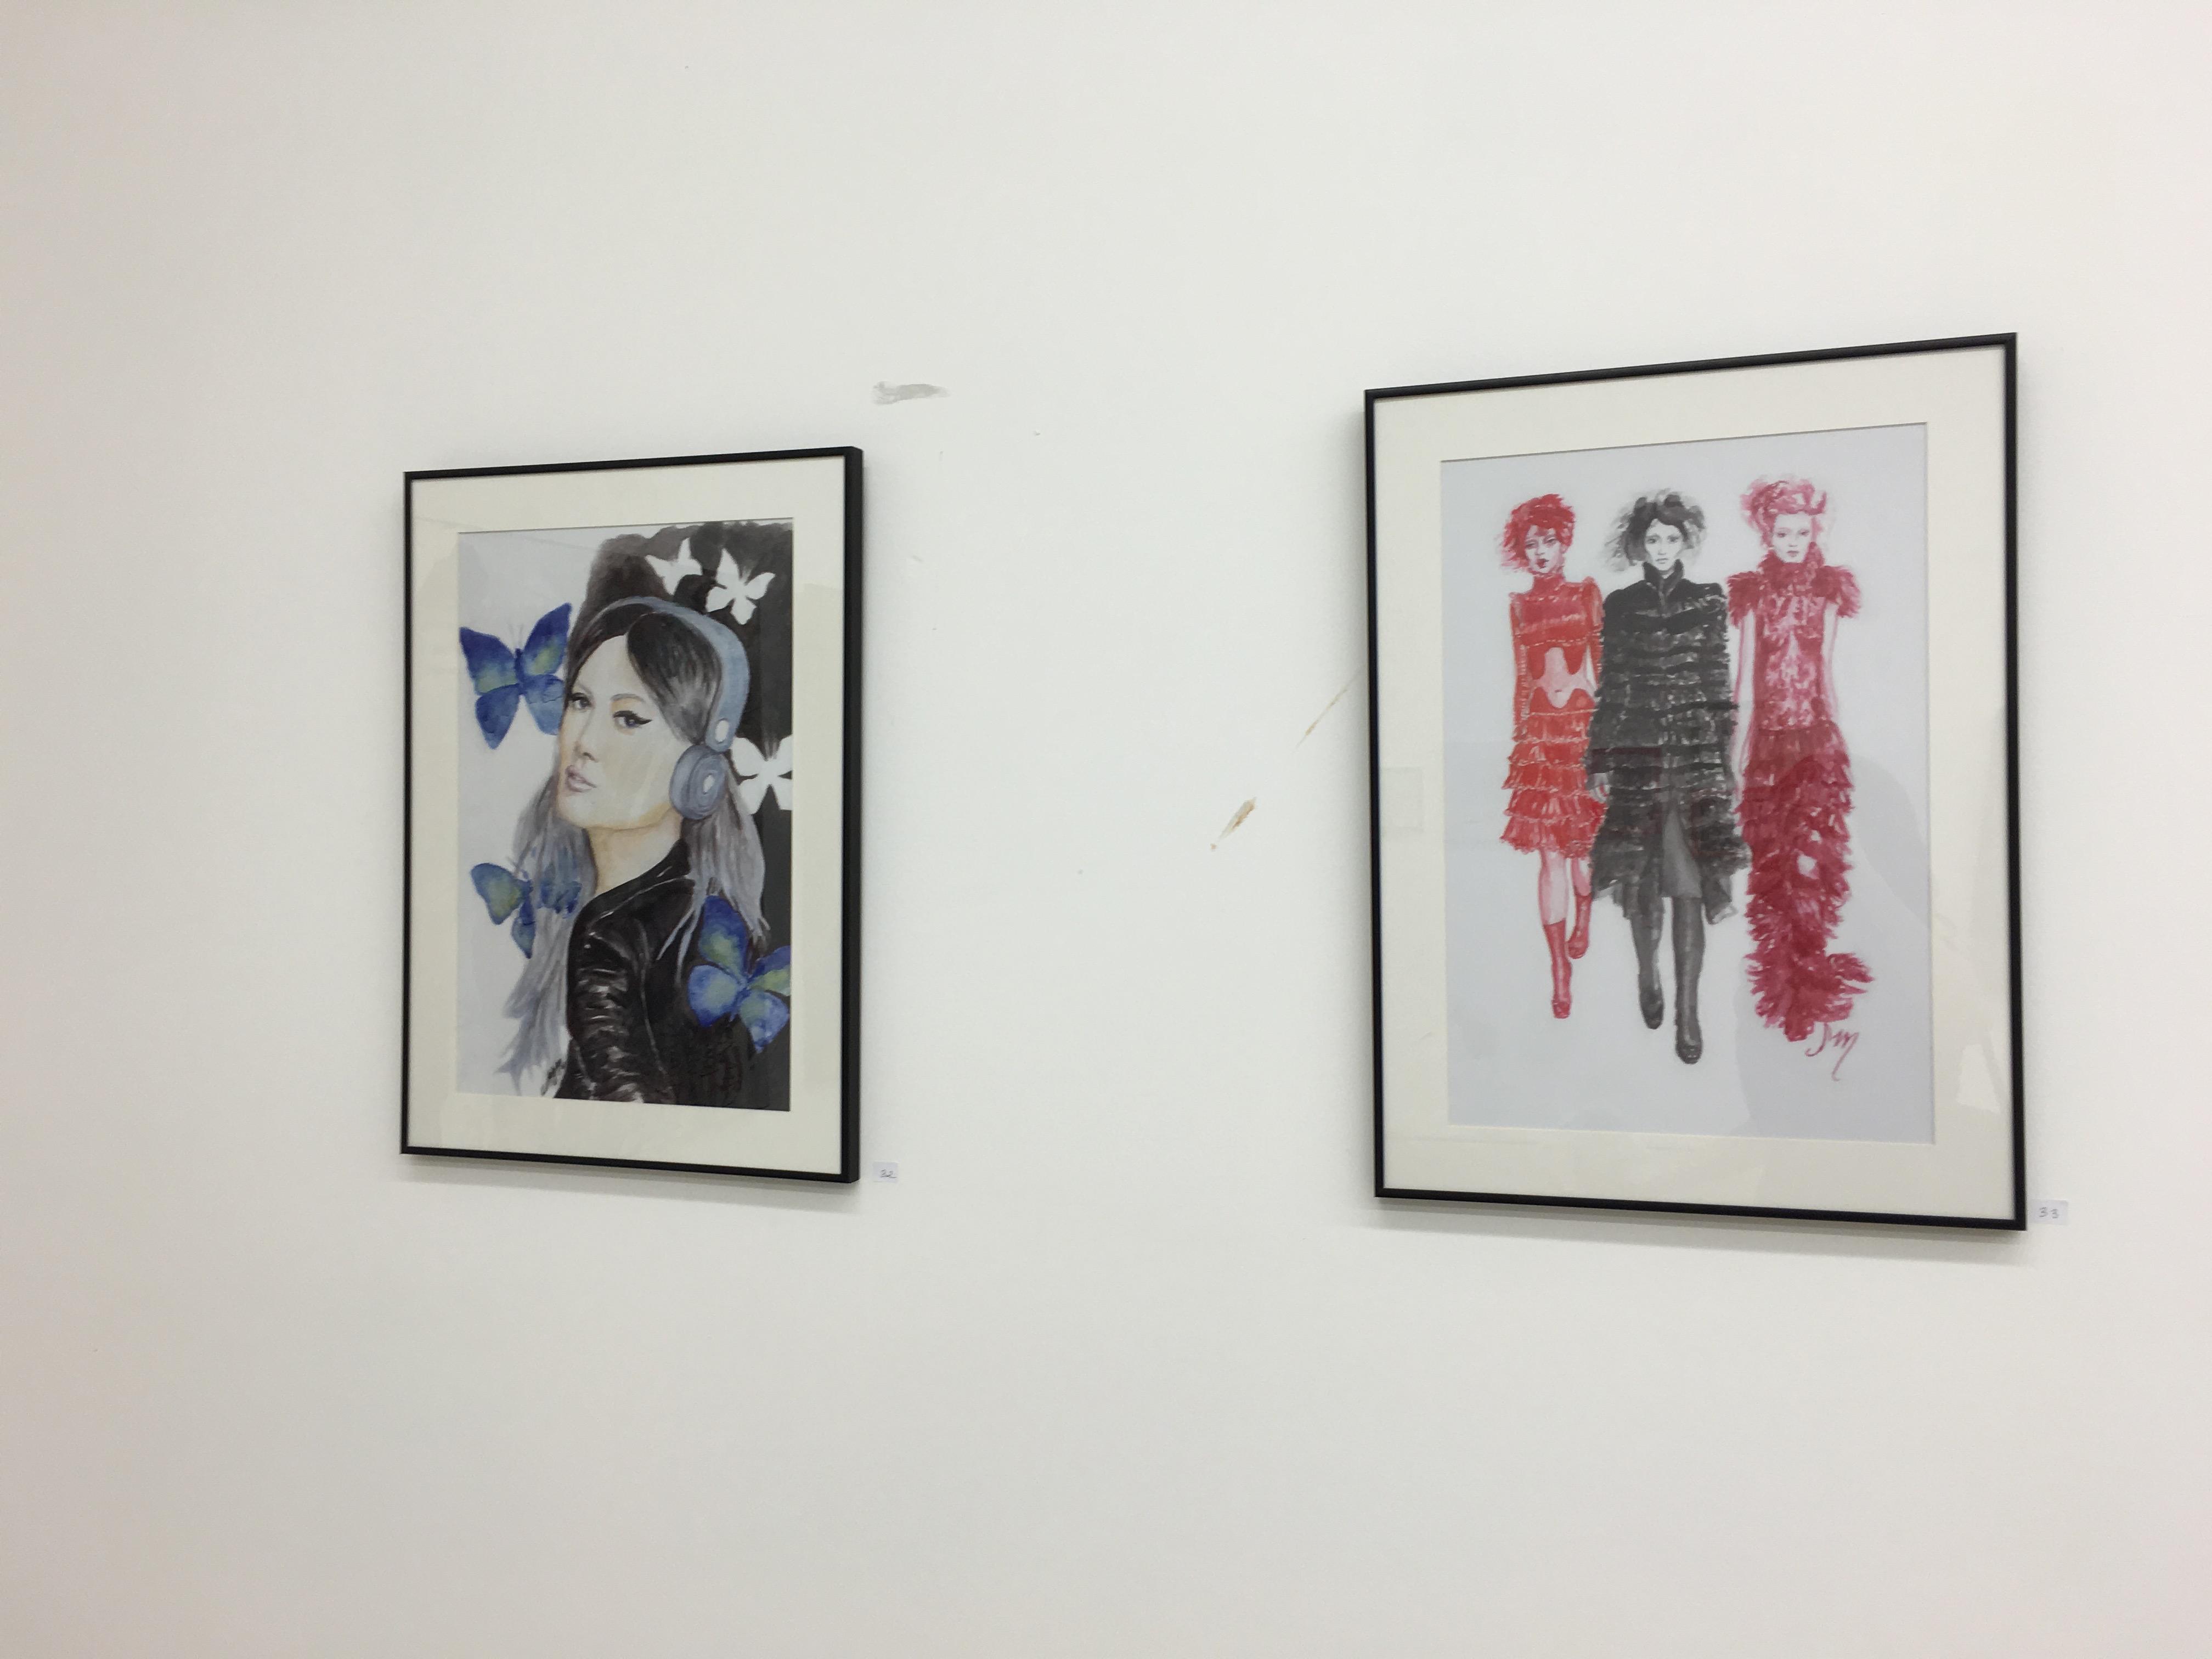 Prints on display at Artfront Galleries in Newark, NJ